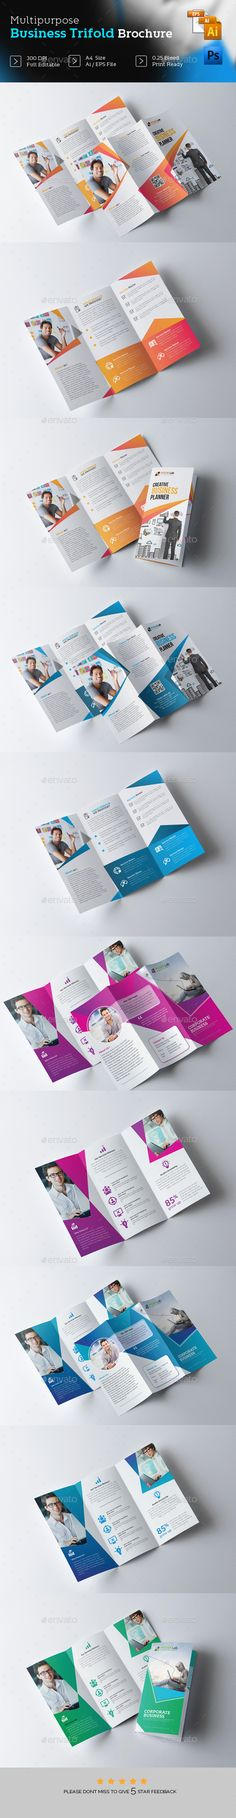 2 Trifold Brochure Design Templates PSD, Vector EPS, InDesign INDD, AI Illustrator